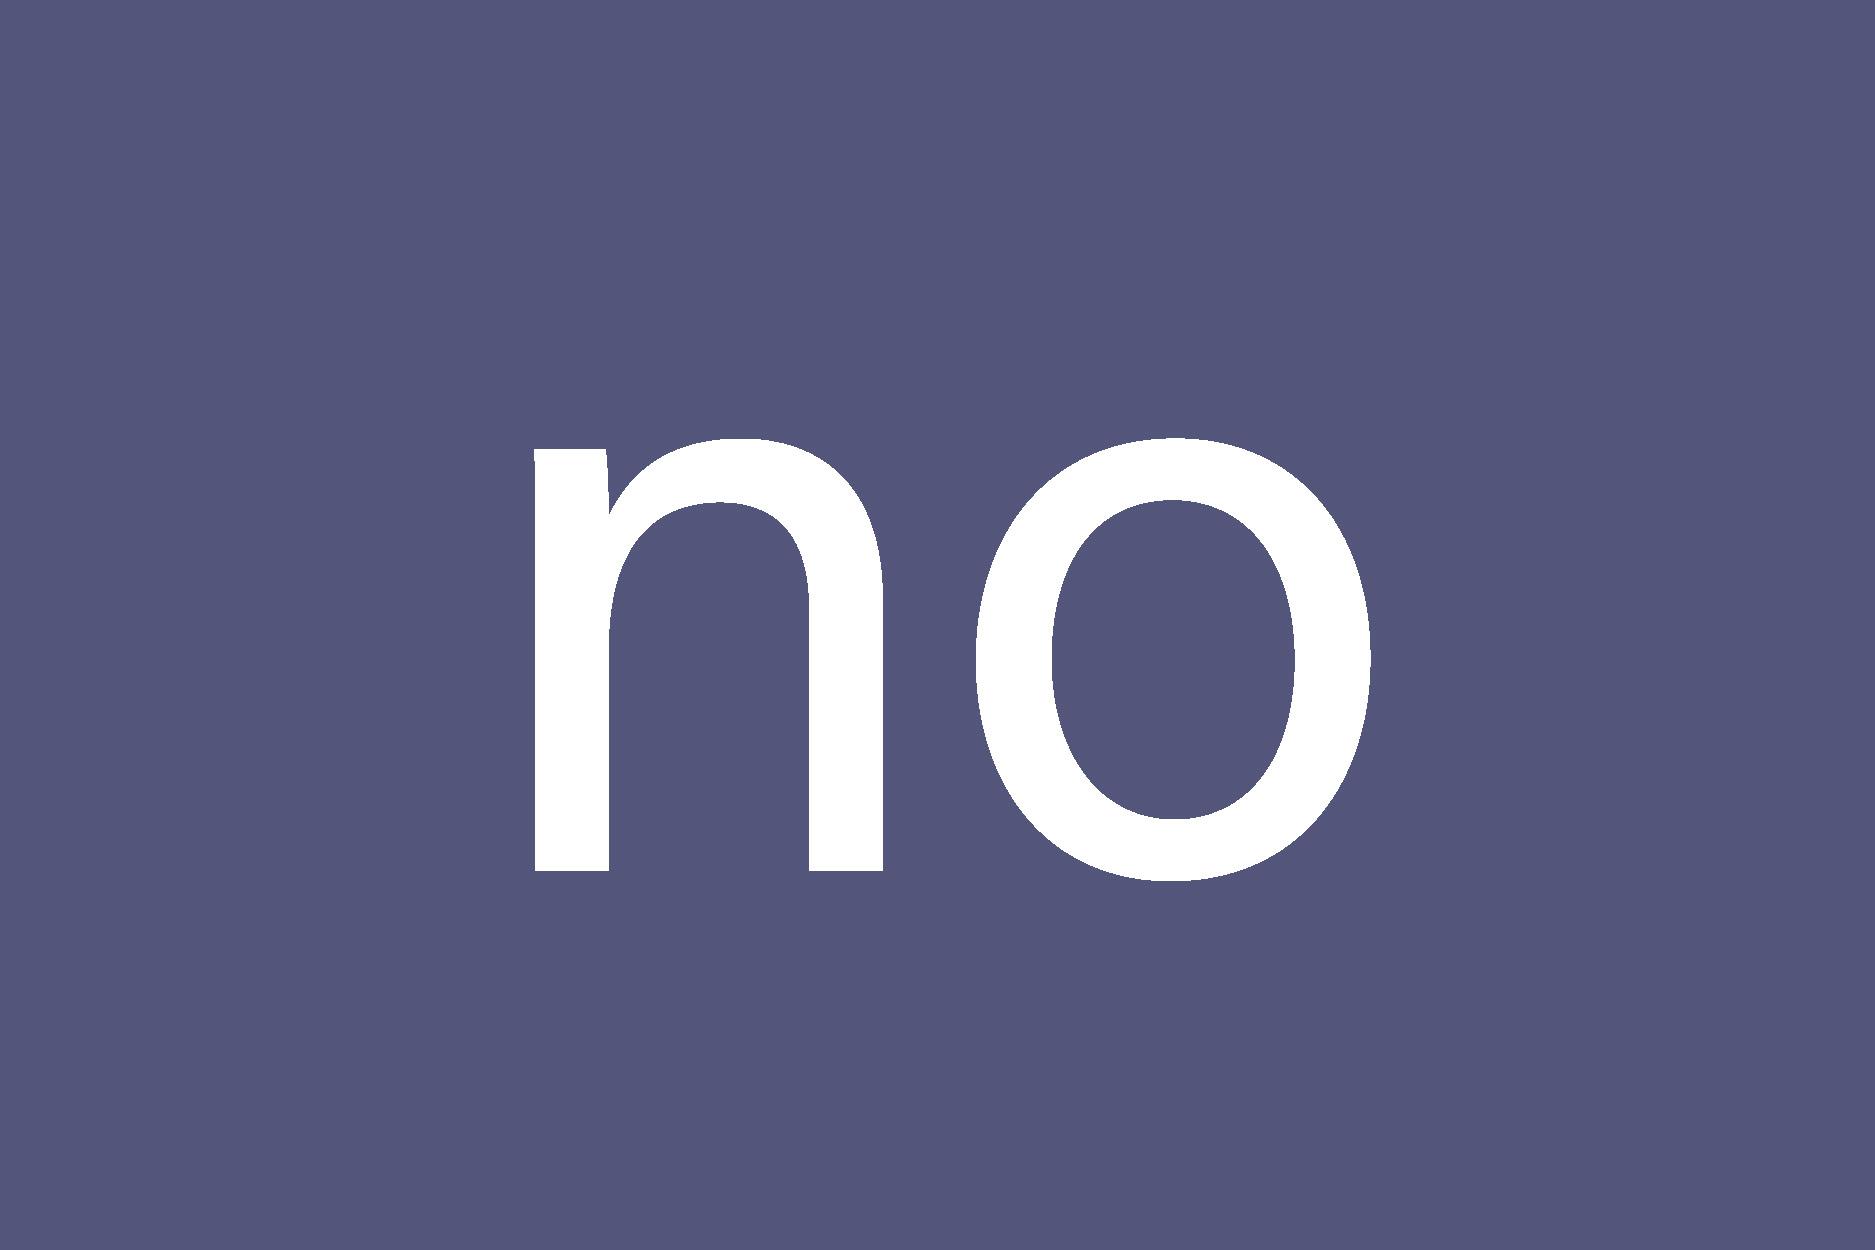 ISO 639-1 language code for Norwegian: NO